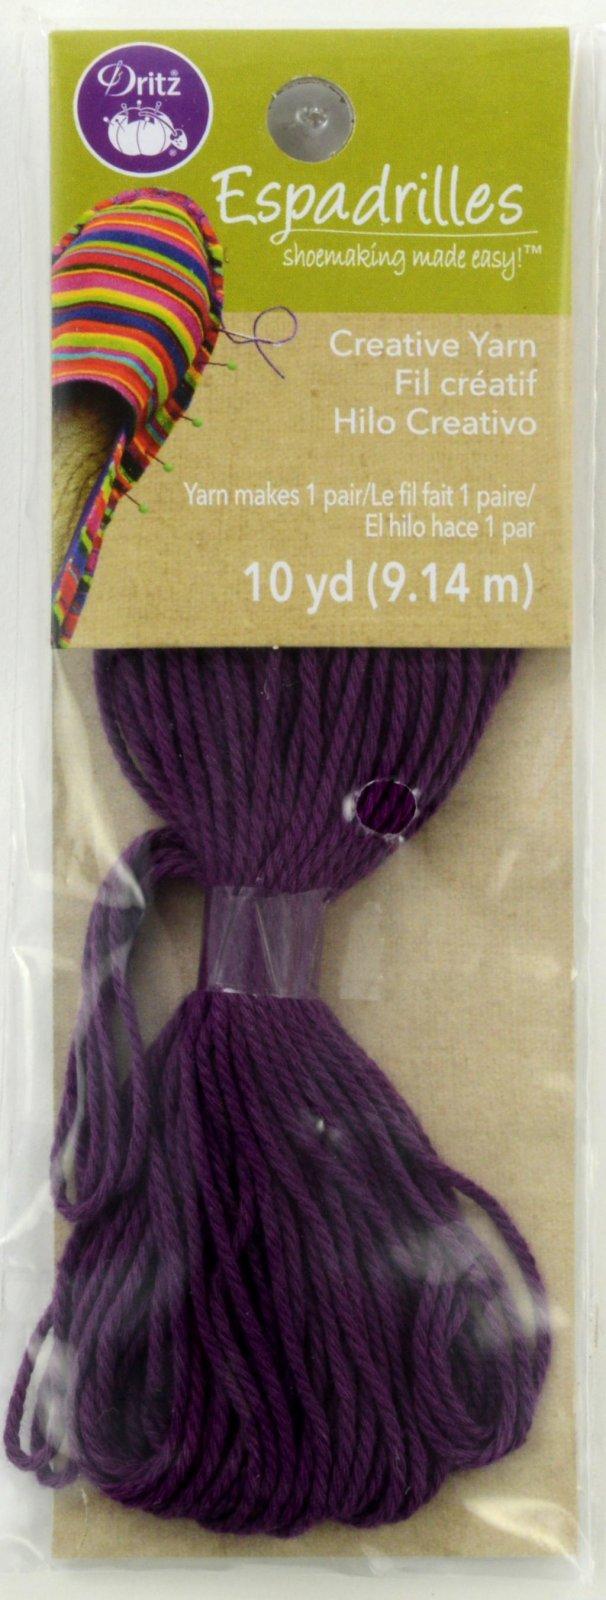 Espadrilles Shoemaking Creative Yarn Purple